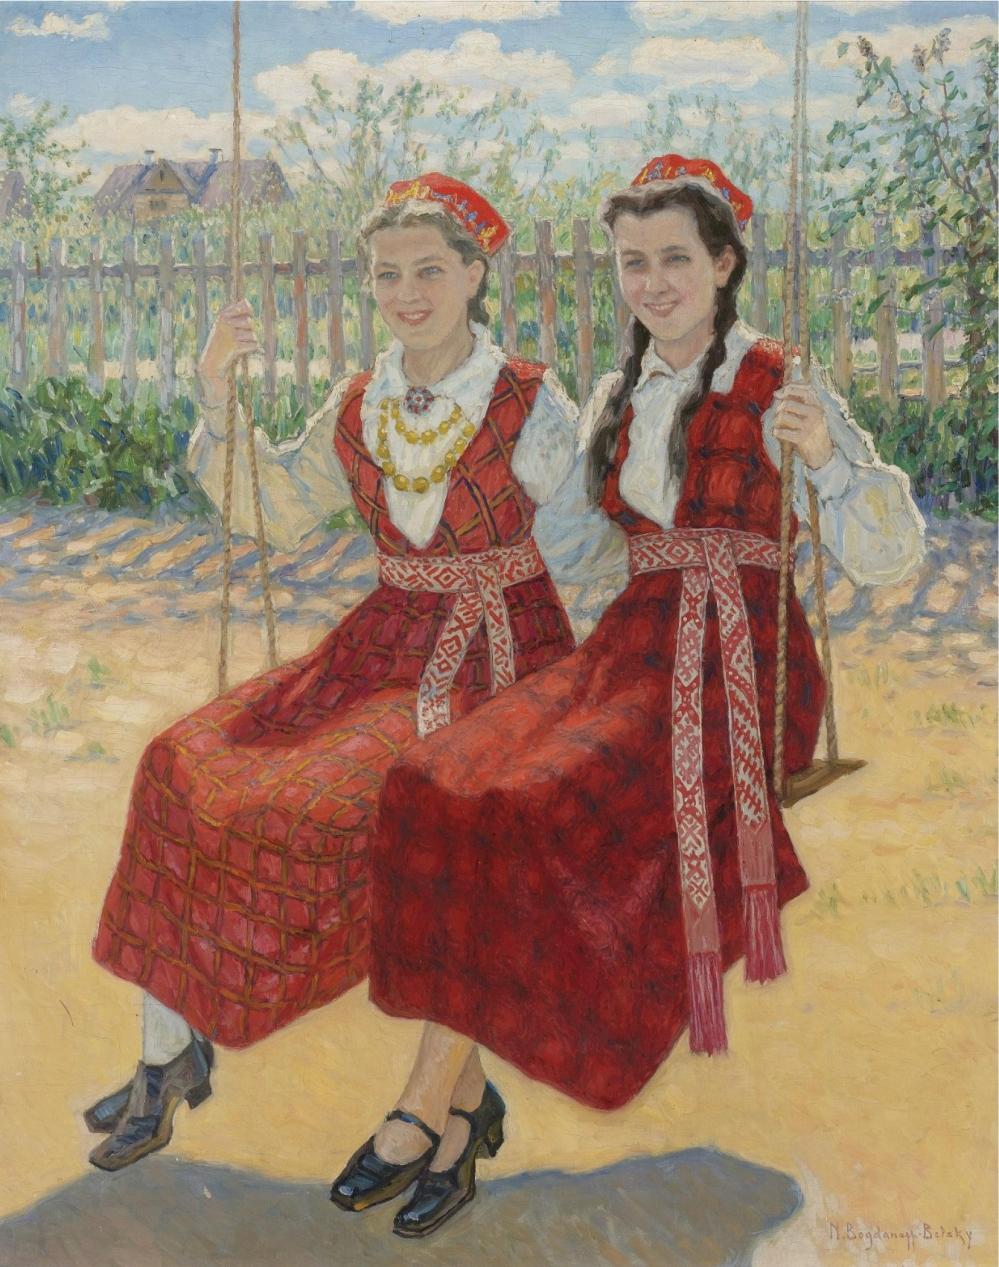 Screenshot_2018-12-02 bogdanov-belsky, nikolai pet russian art sotheby's n08538lot3pjj7en